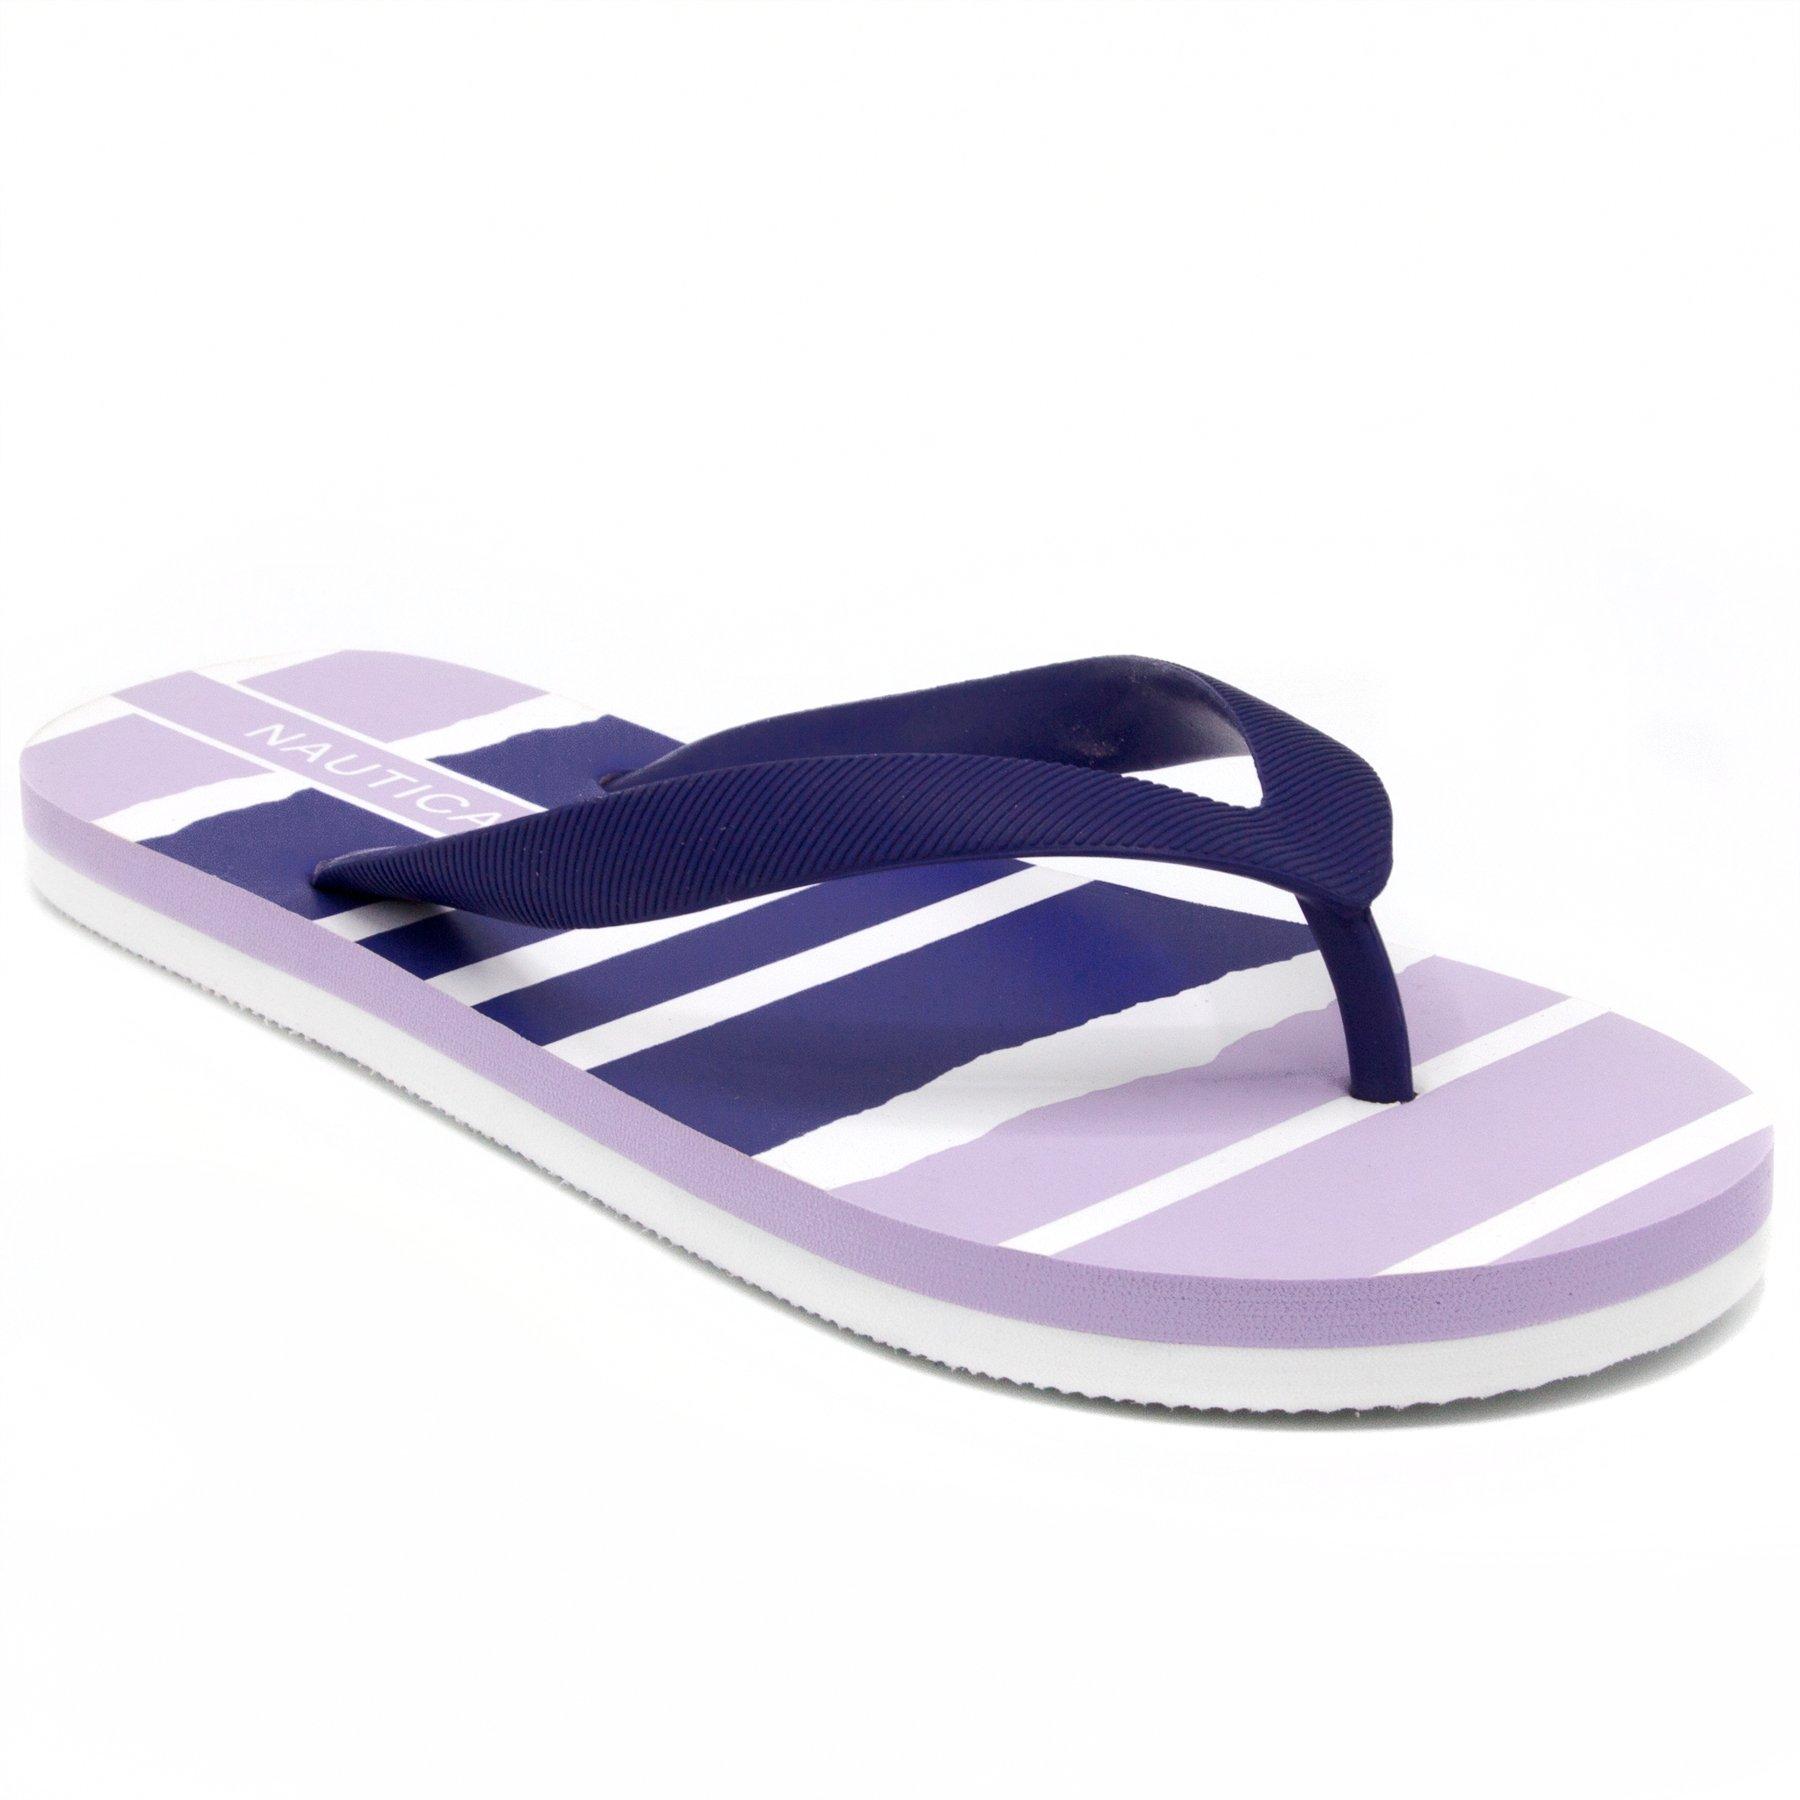 Nautica Women's Pintle Flip Flop, Beach Sandal, Thong Style Boat Slide, Lilac-7